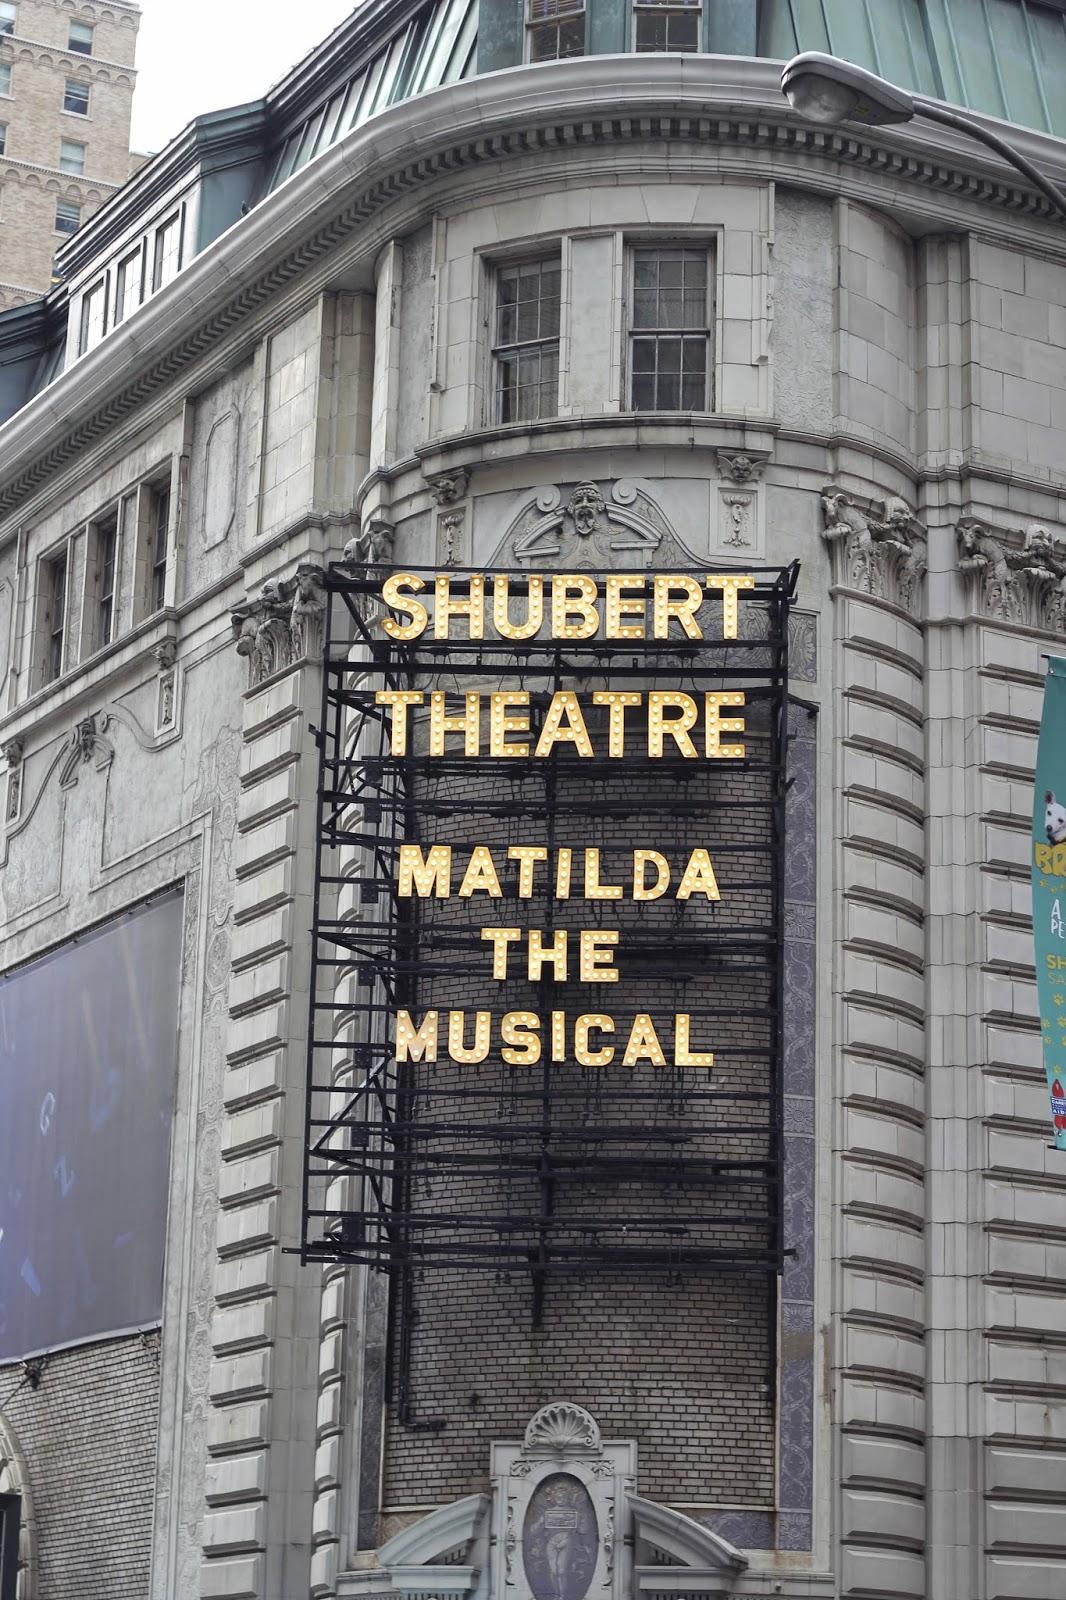 Broadway, Shubert Theatre